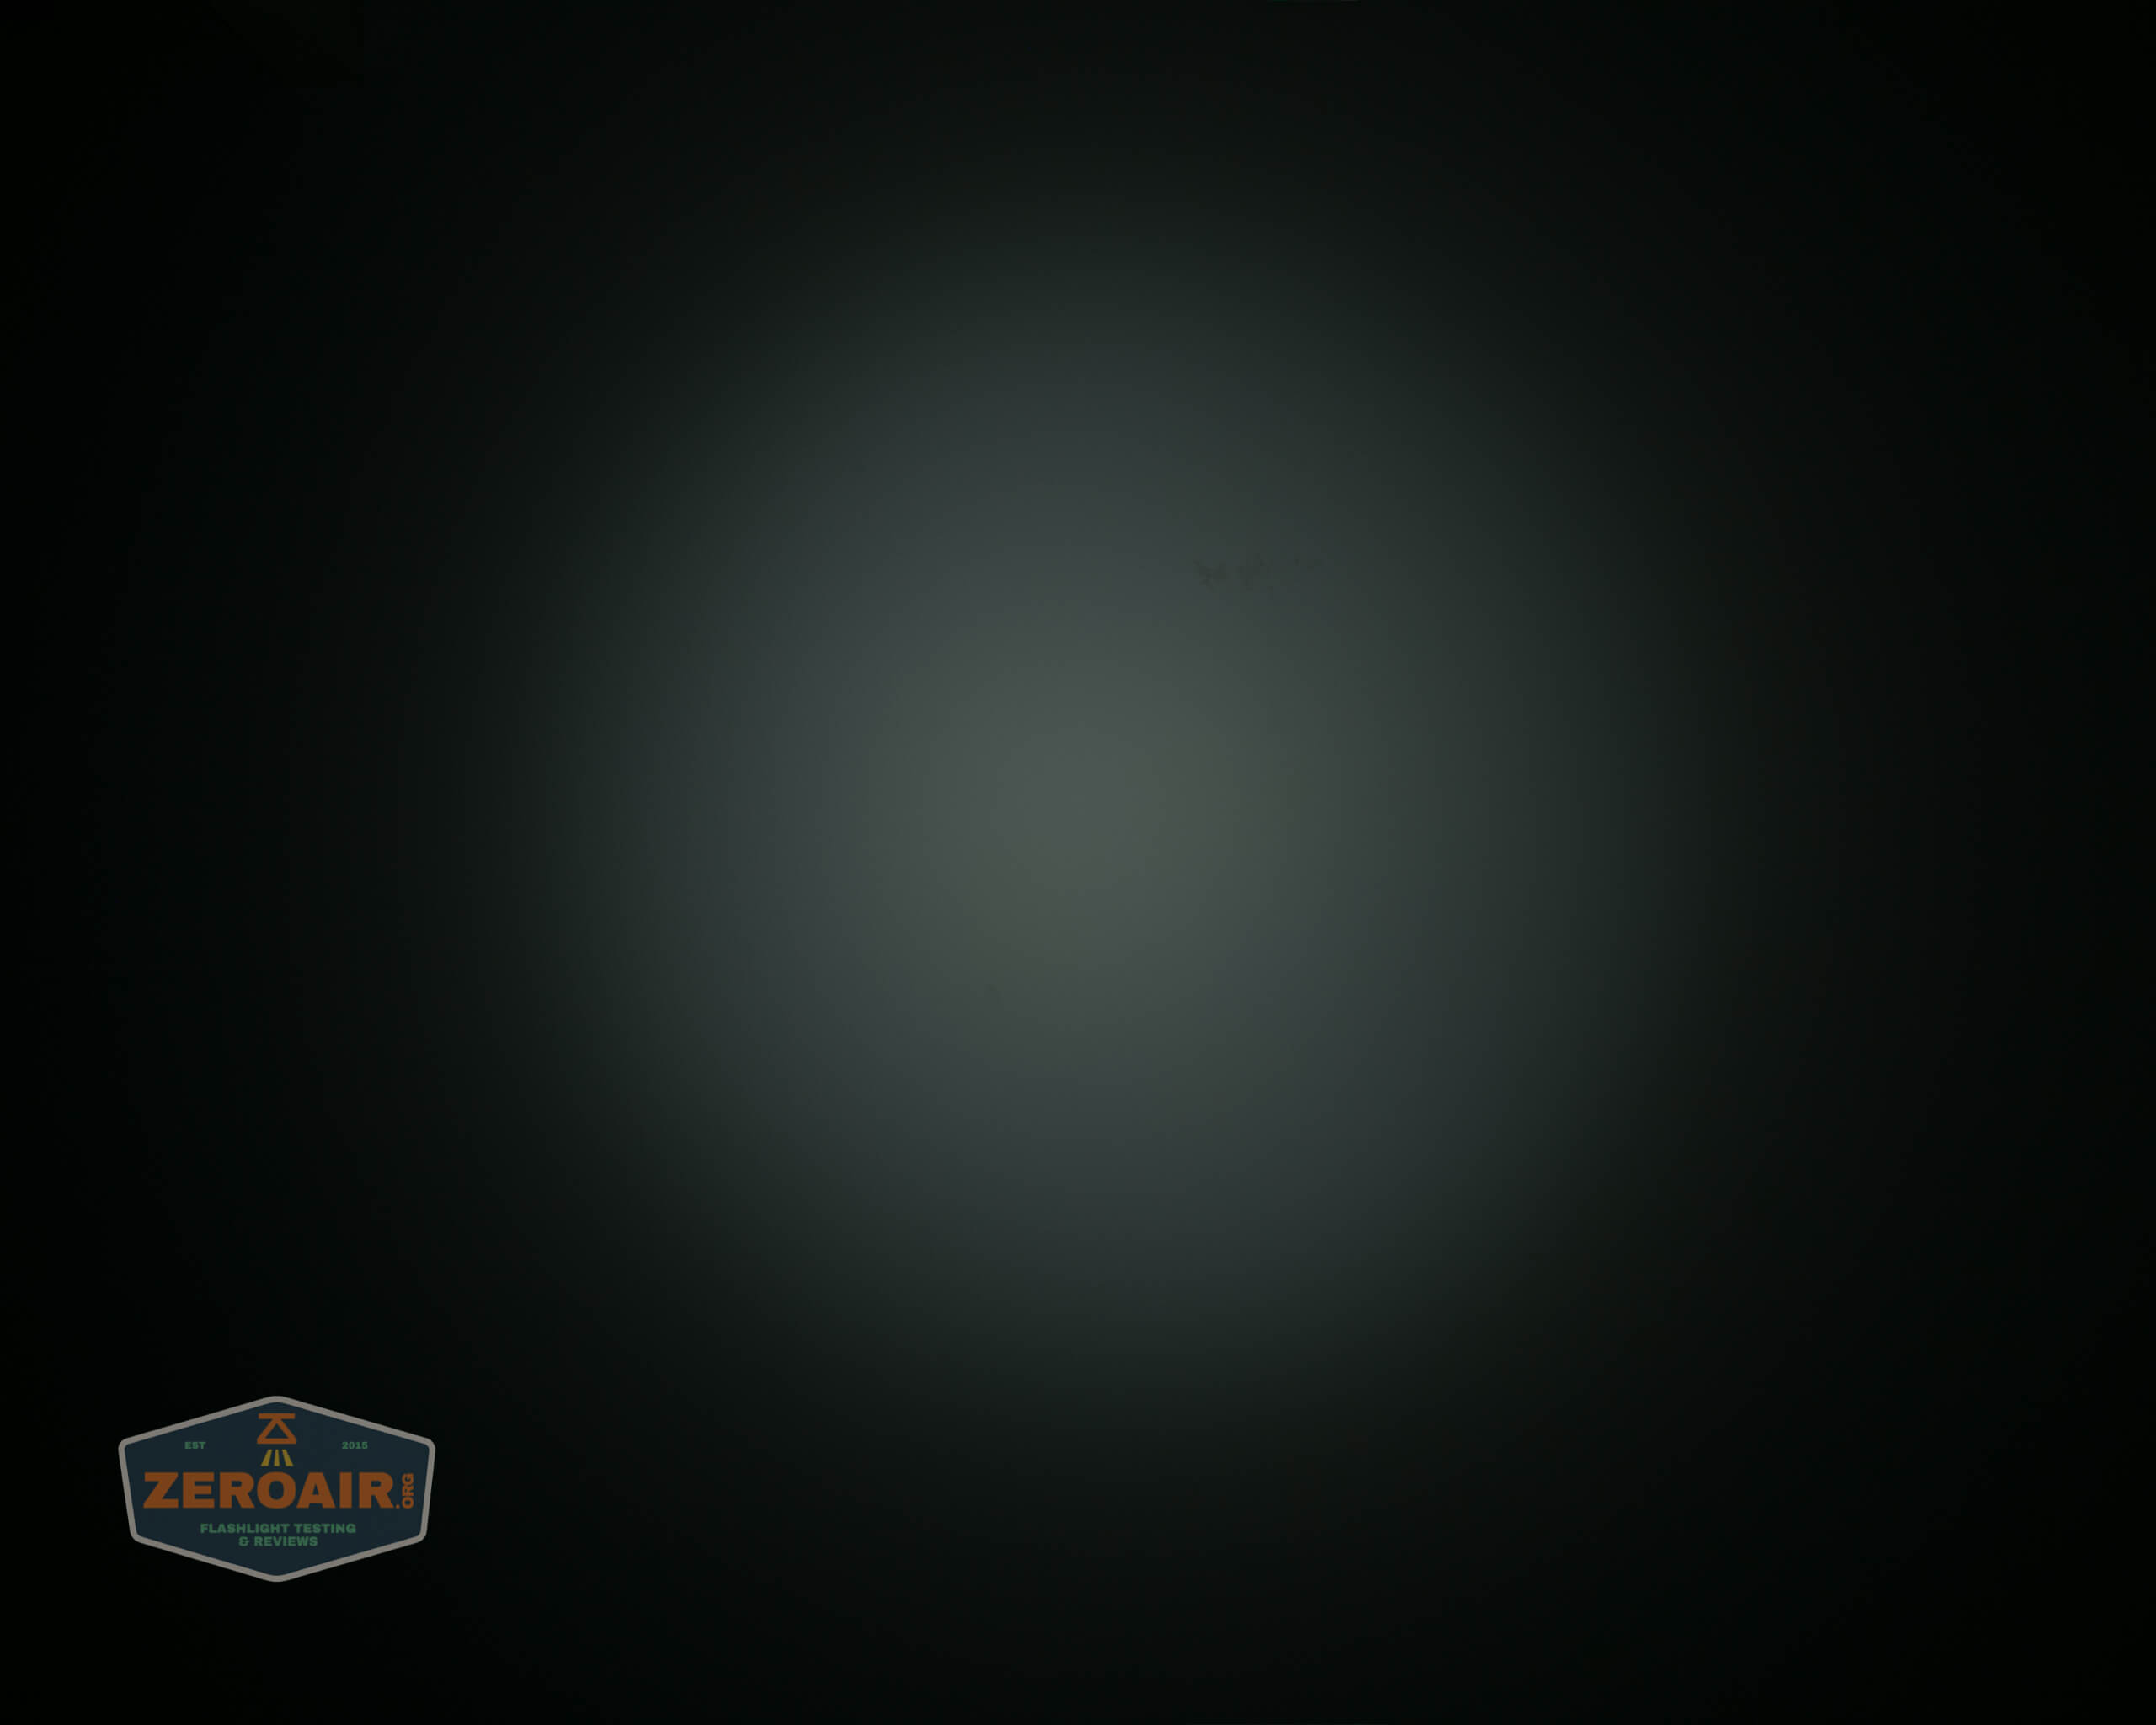 olight perun 2 21700 headlamp orange beamshot ceiling 3